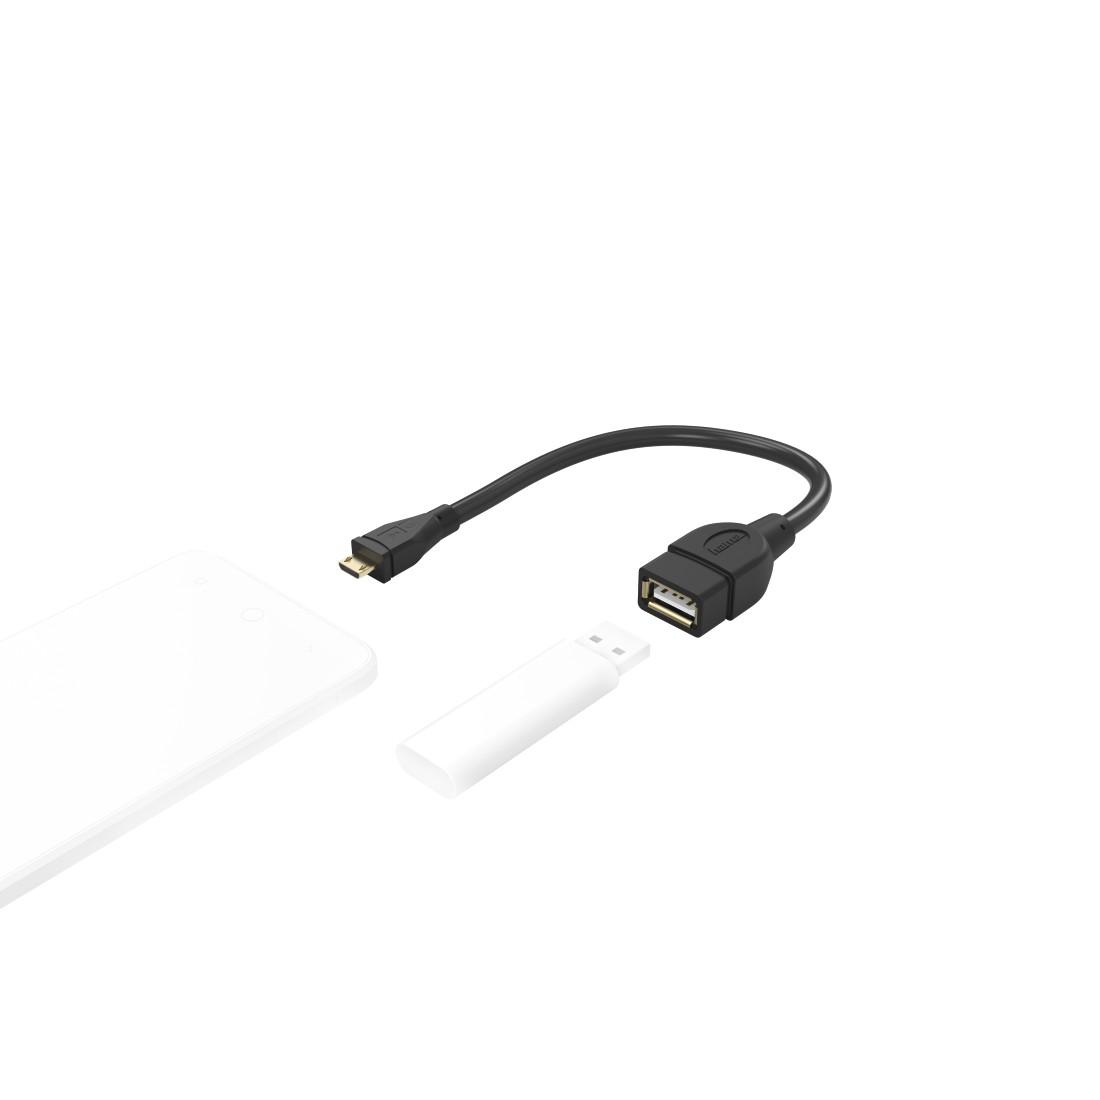 Black 15 cm Micro B Plug OTG A Socket Hama USB 2.0 Adapter Cable